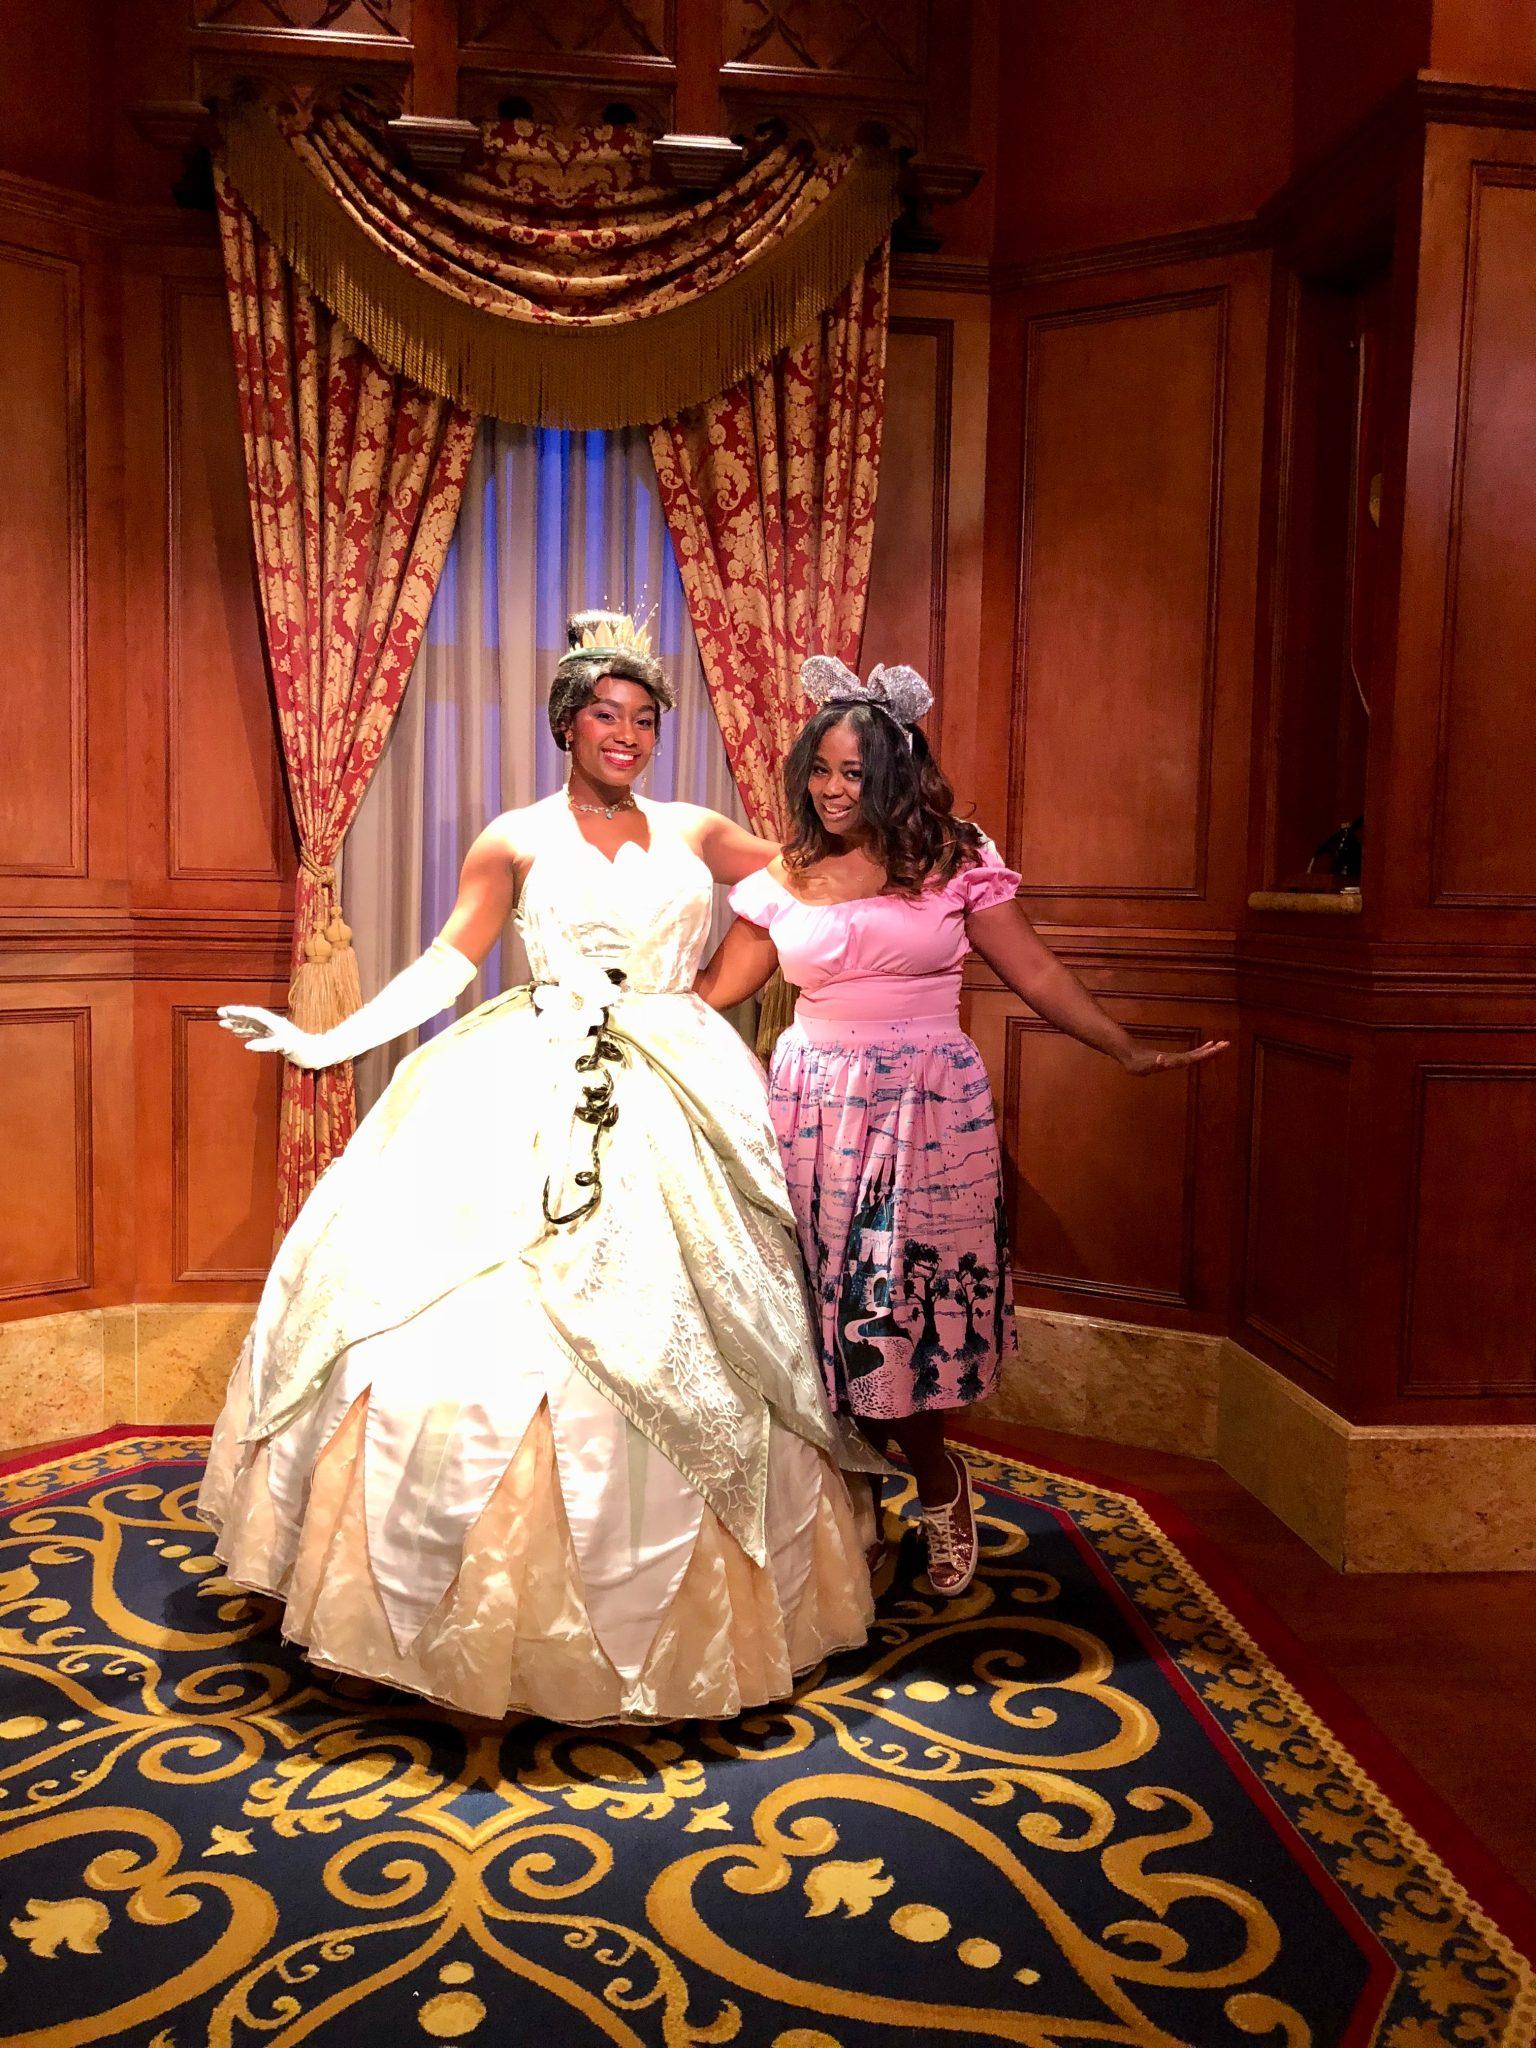 Meeting Lots Of Disney Princesses & Characters At Disney's Magic Kingdom